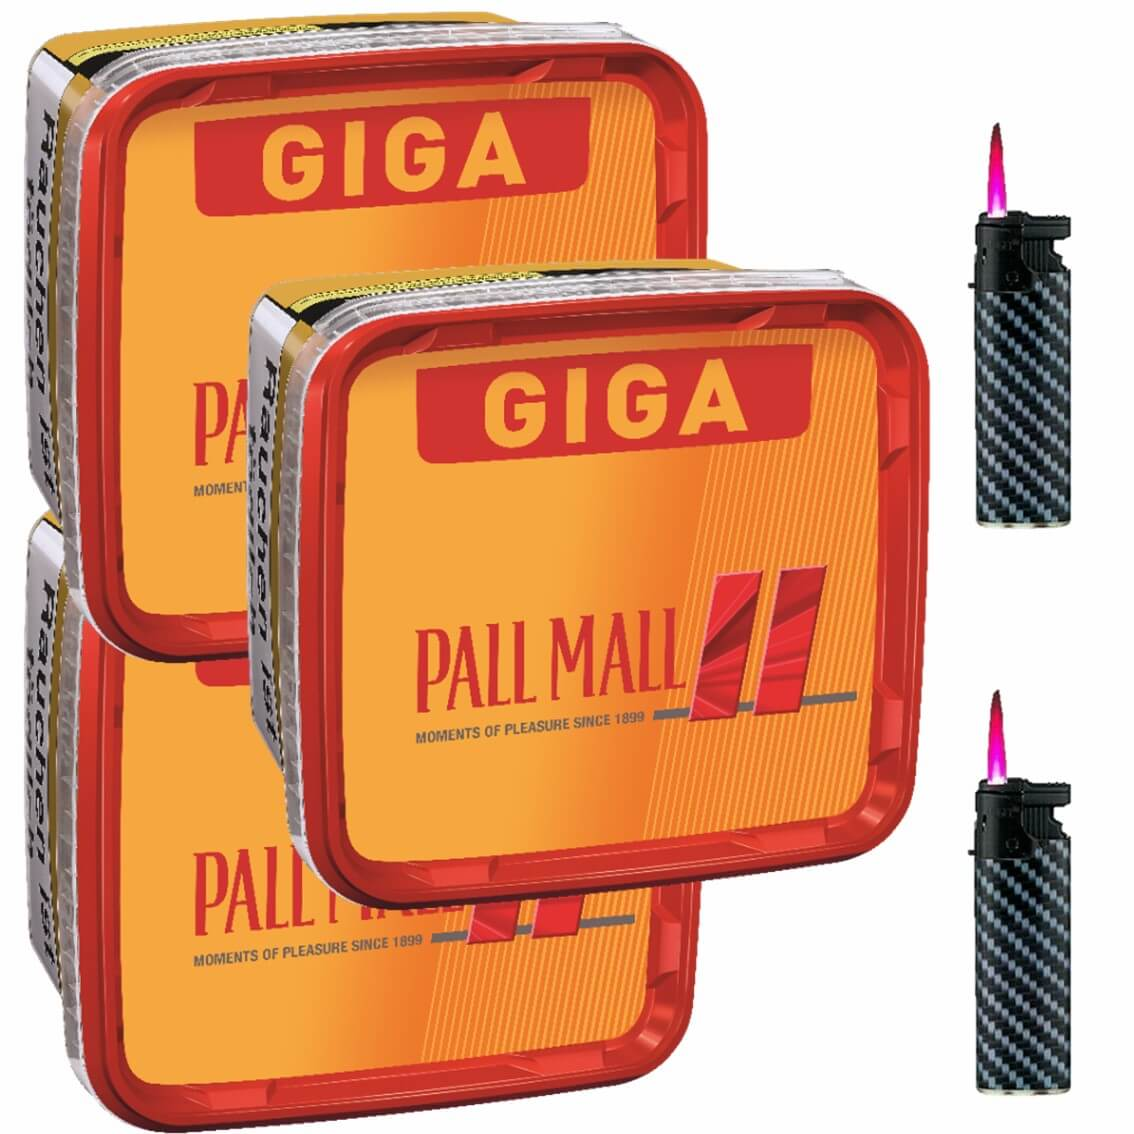 Pall Mall Giga Box 3 x 280g Volumentabak 2 x Sturmfeuerzeuge